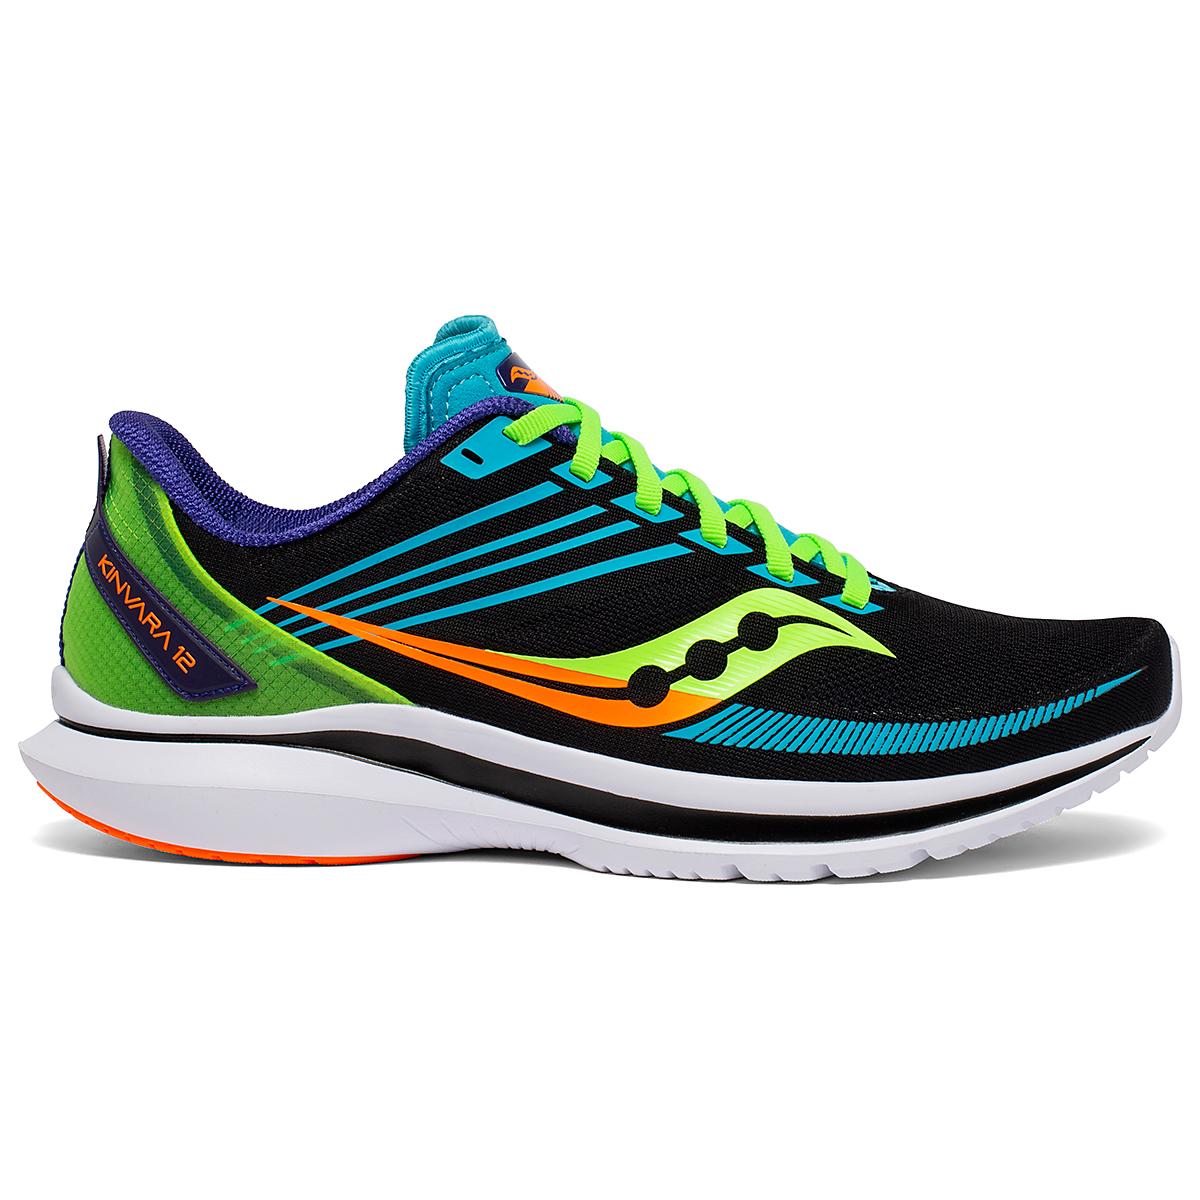 Men's Saucony Kinvara 12 Running Shoe - Color: Future/Black - Size: 7 - Width: Regular, Future/Black, large, image 1